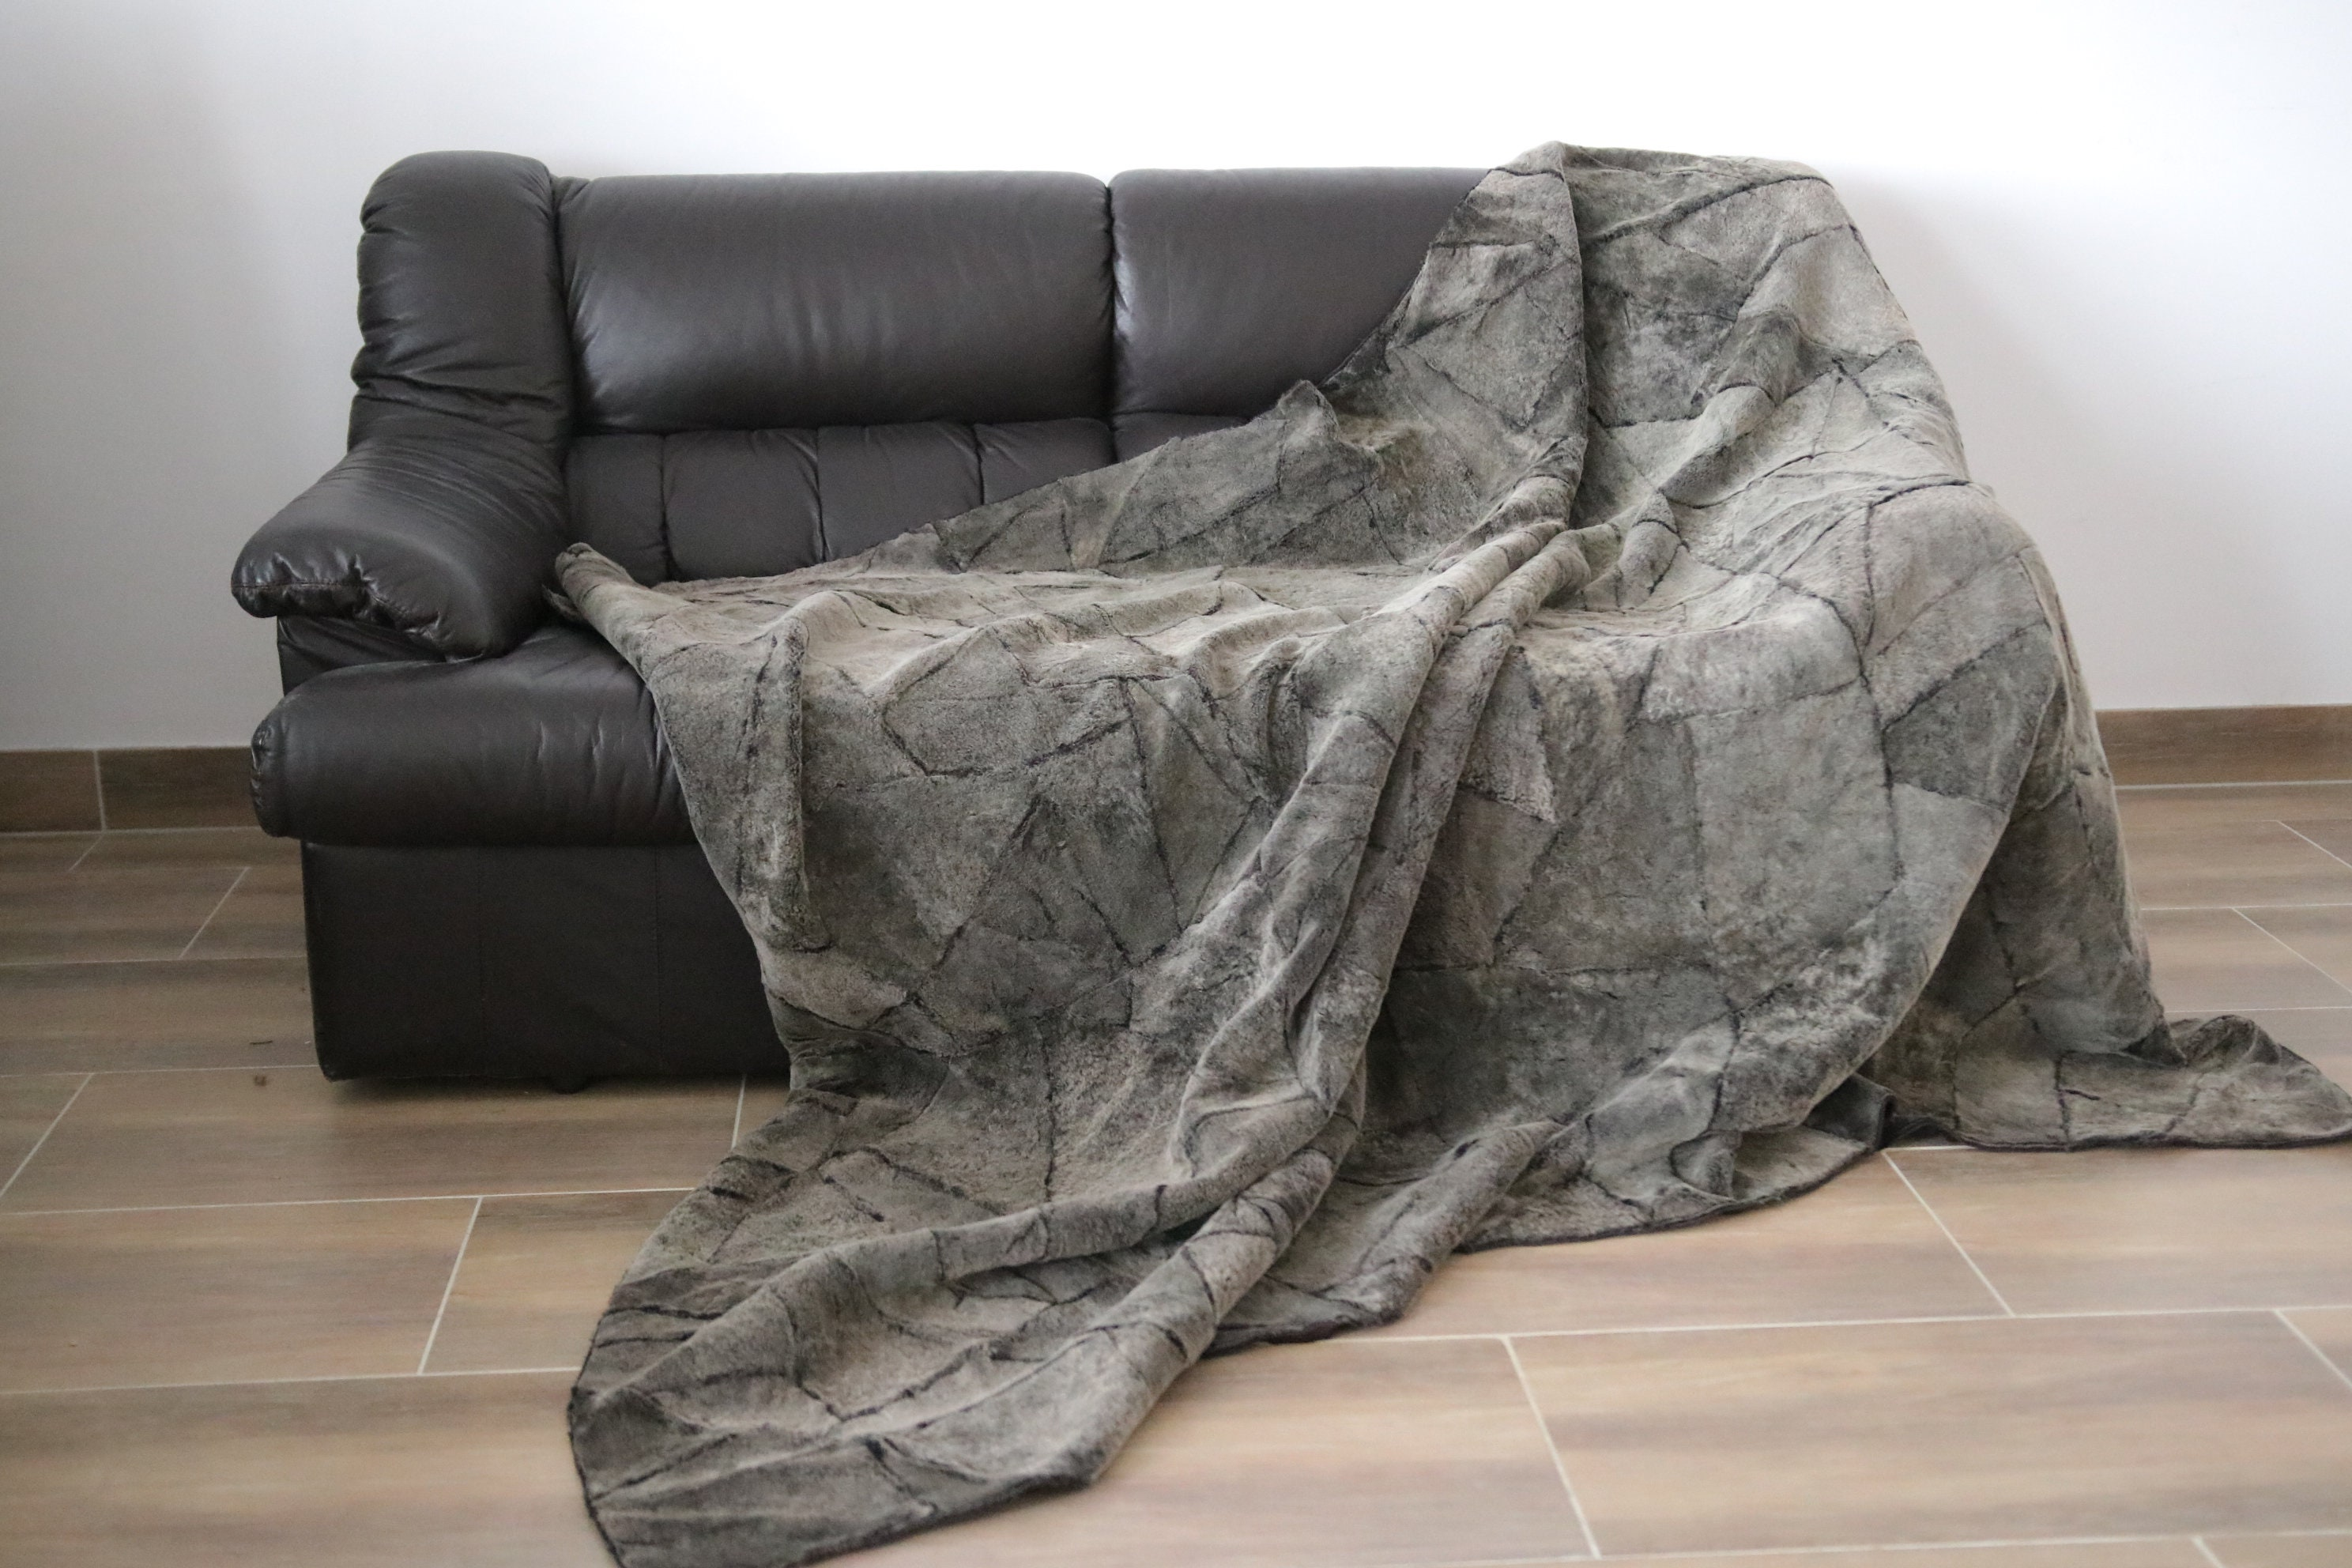 Genial Exclusive Real Gray Sheepskin Blanket Throw, Fur Sofa Throw, Scandinavian  Decoration, Throws For Sofa, Sofa Throws, Luxury Throws